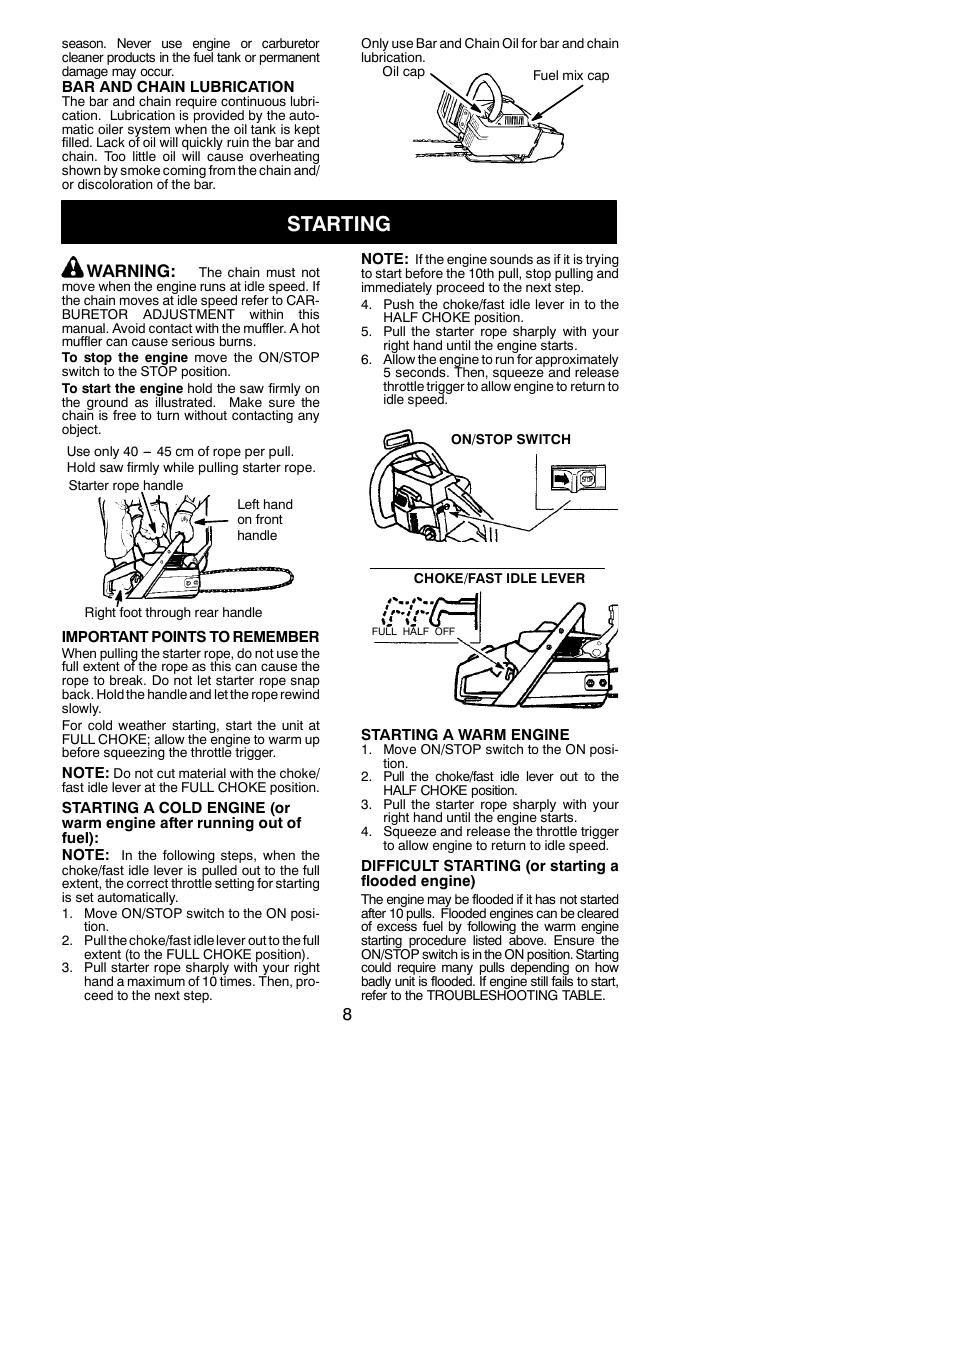 starting warning husqvarna 137 user manual page 8 16 rh manualsdir com husqvarna e series 137 manual husqvarna 137 repair manual